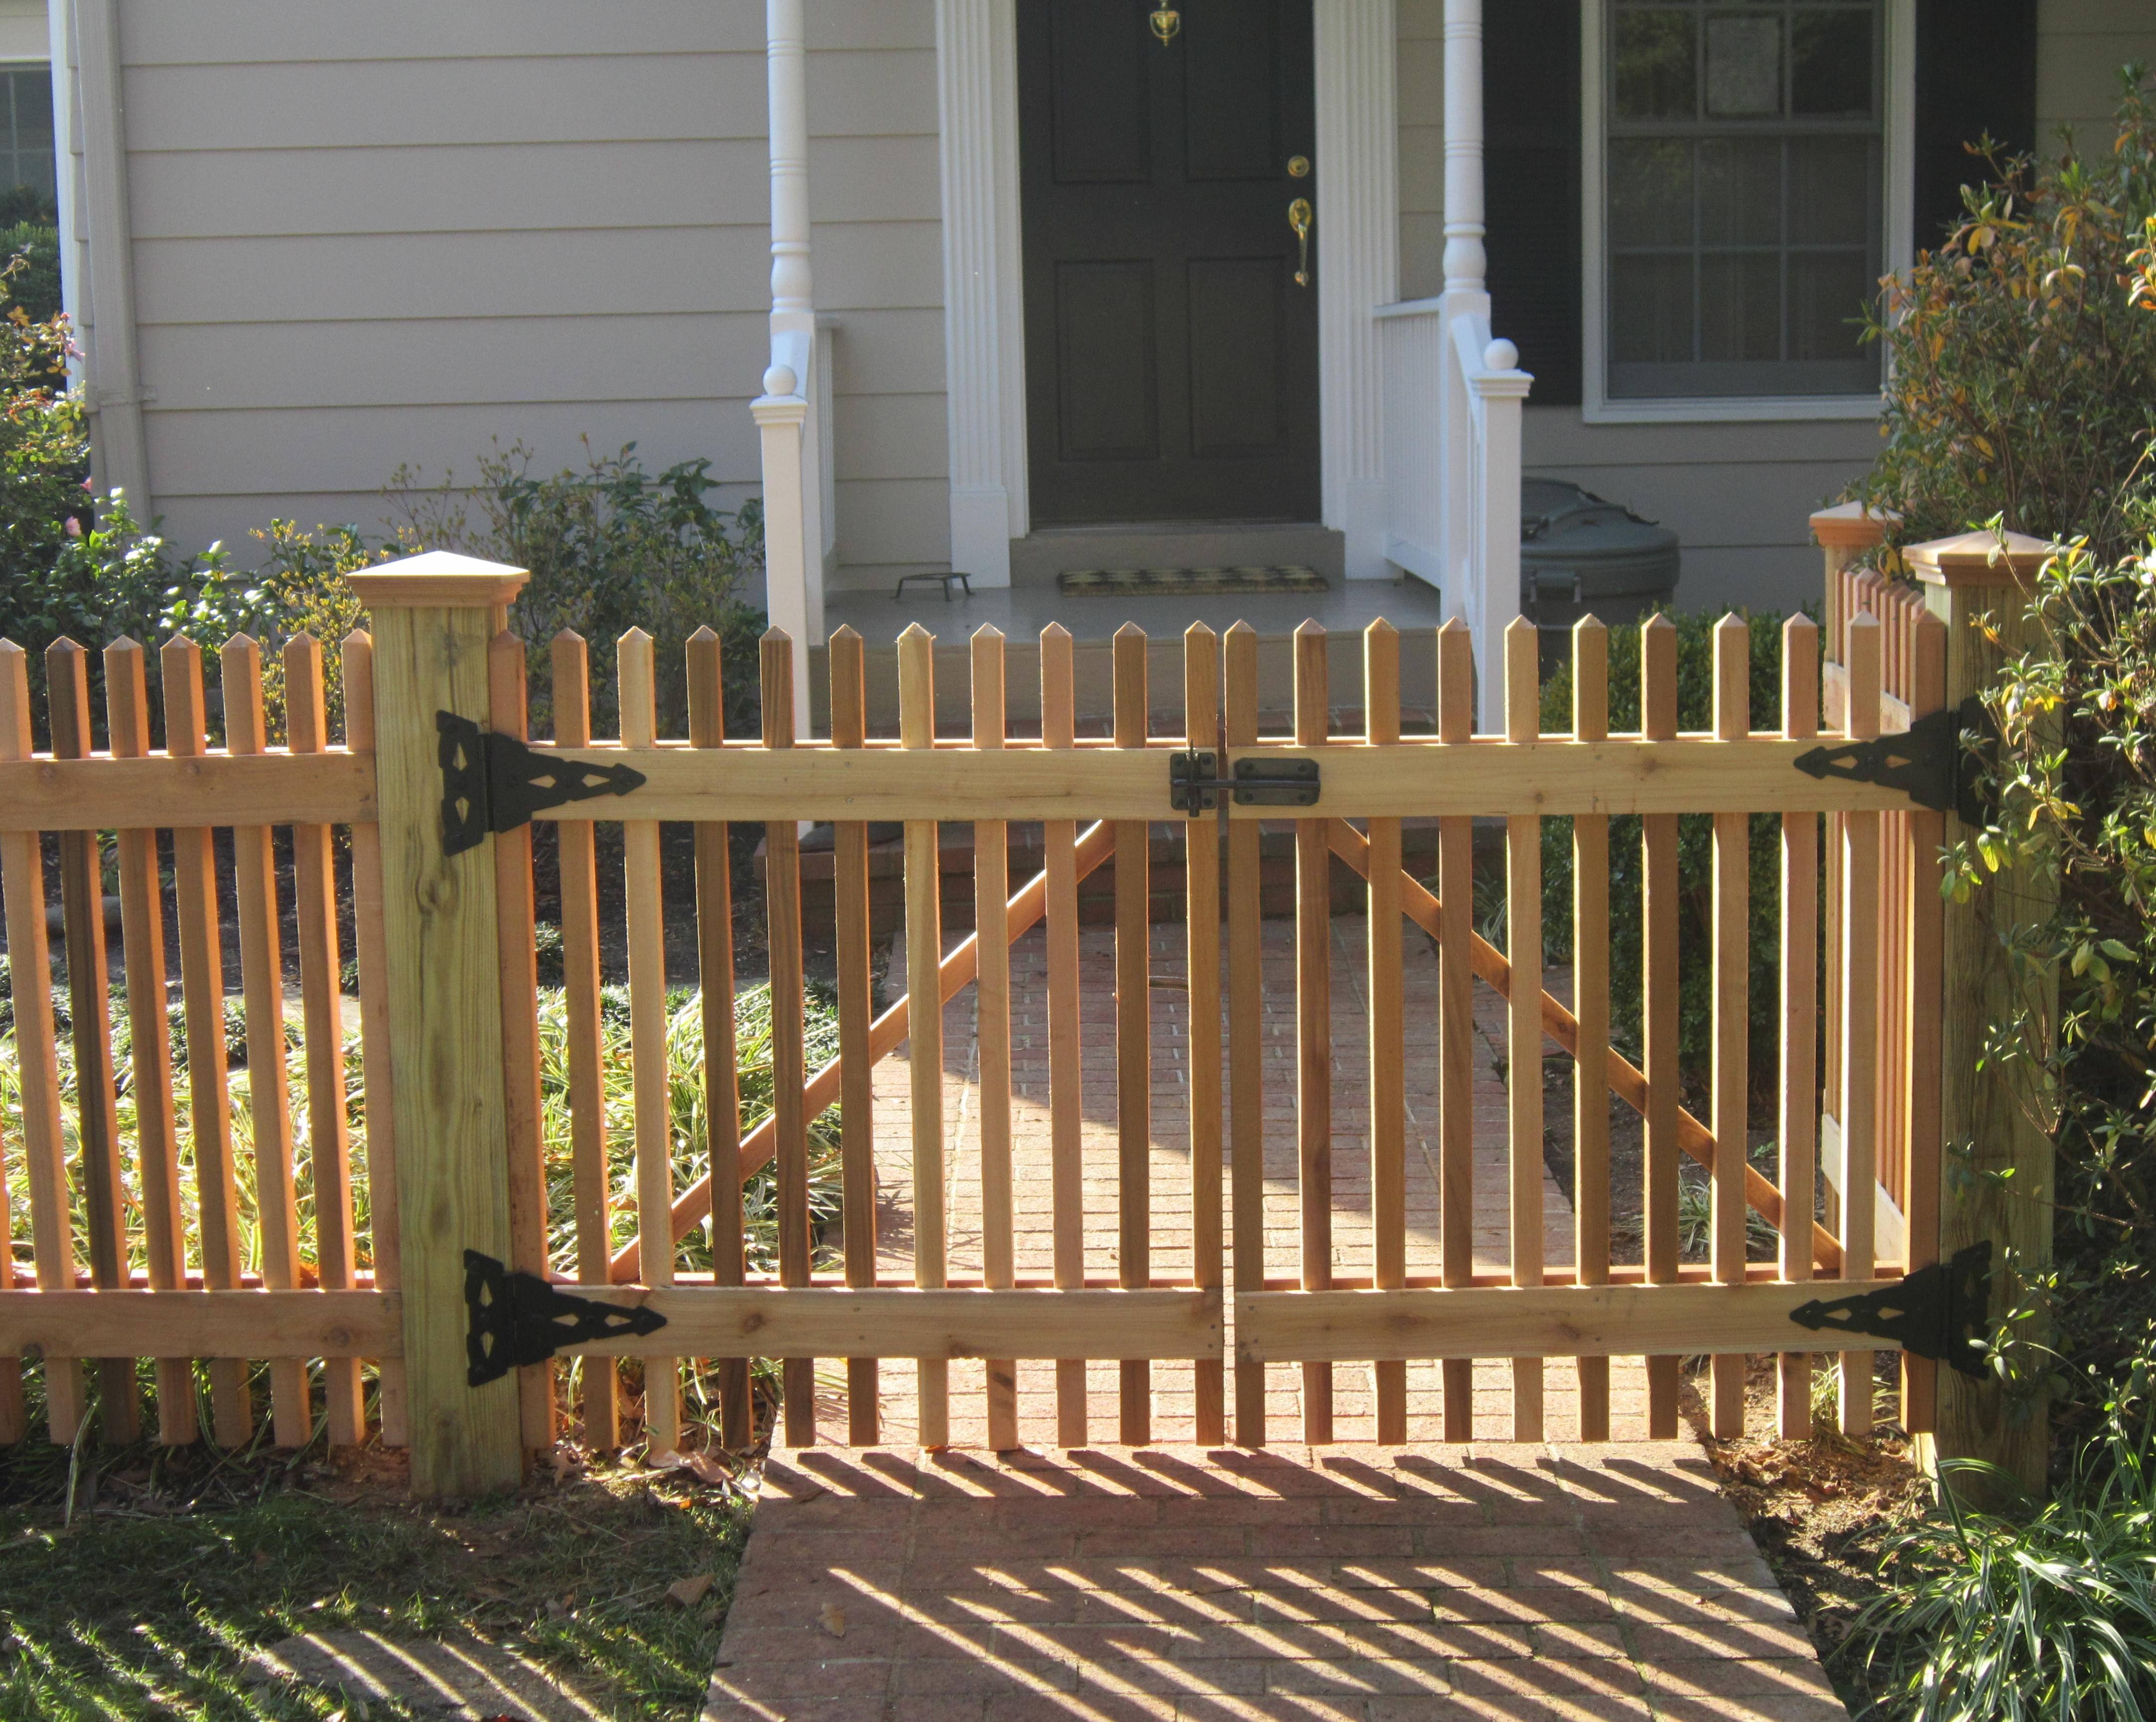 Wood Picket Fence Double Gate Poolesville Picket Style Wood Picket Fence Backyard Fences Wooden Garden Gate